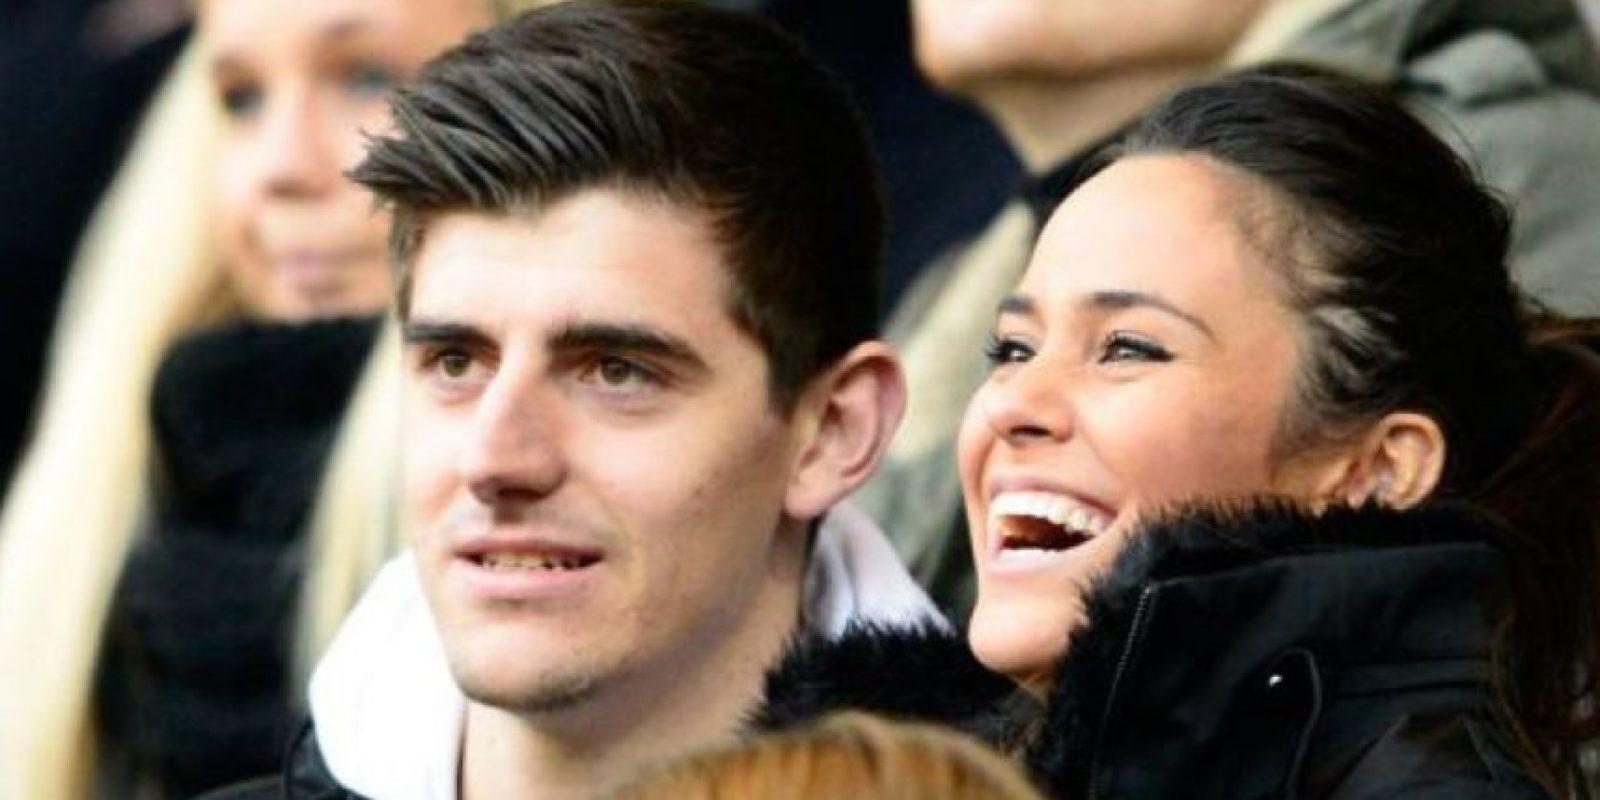 Su pareja formal es Marta Domínguez Foto:Vía instagram.com/thibautcourtois